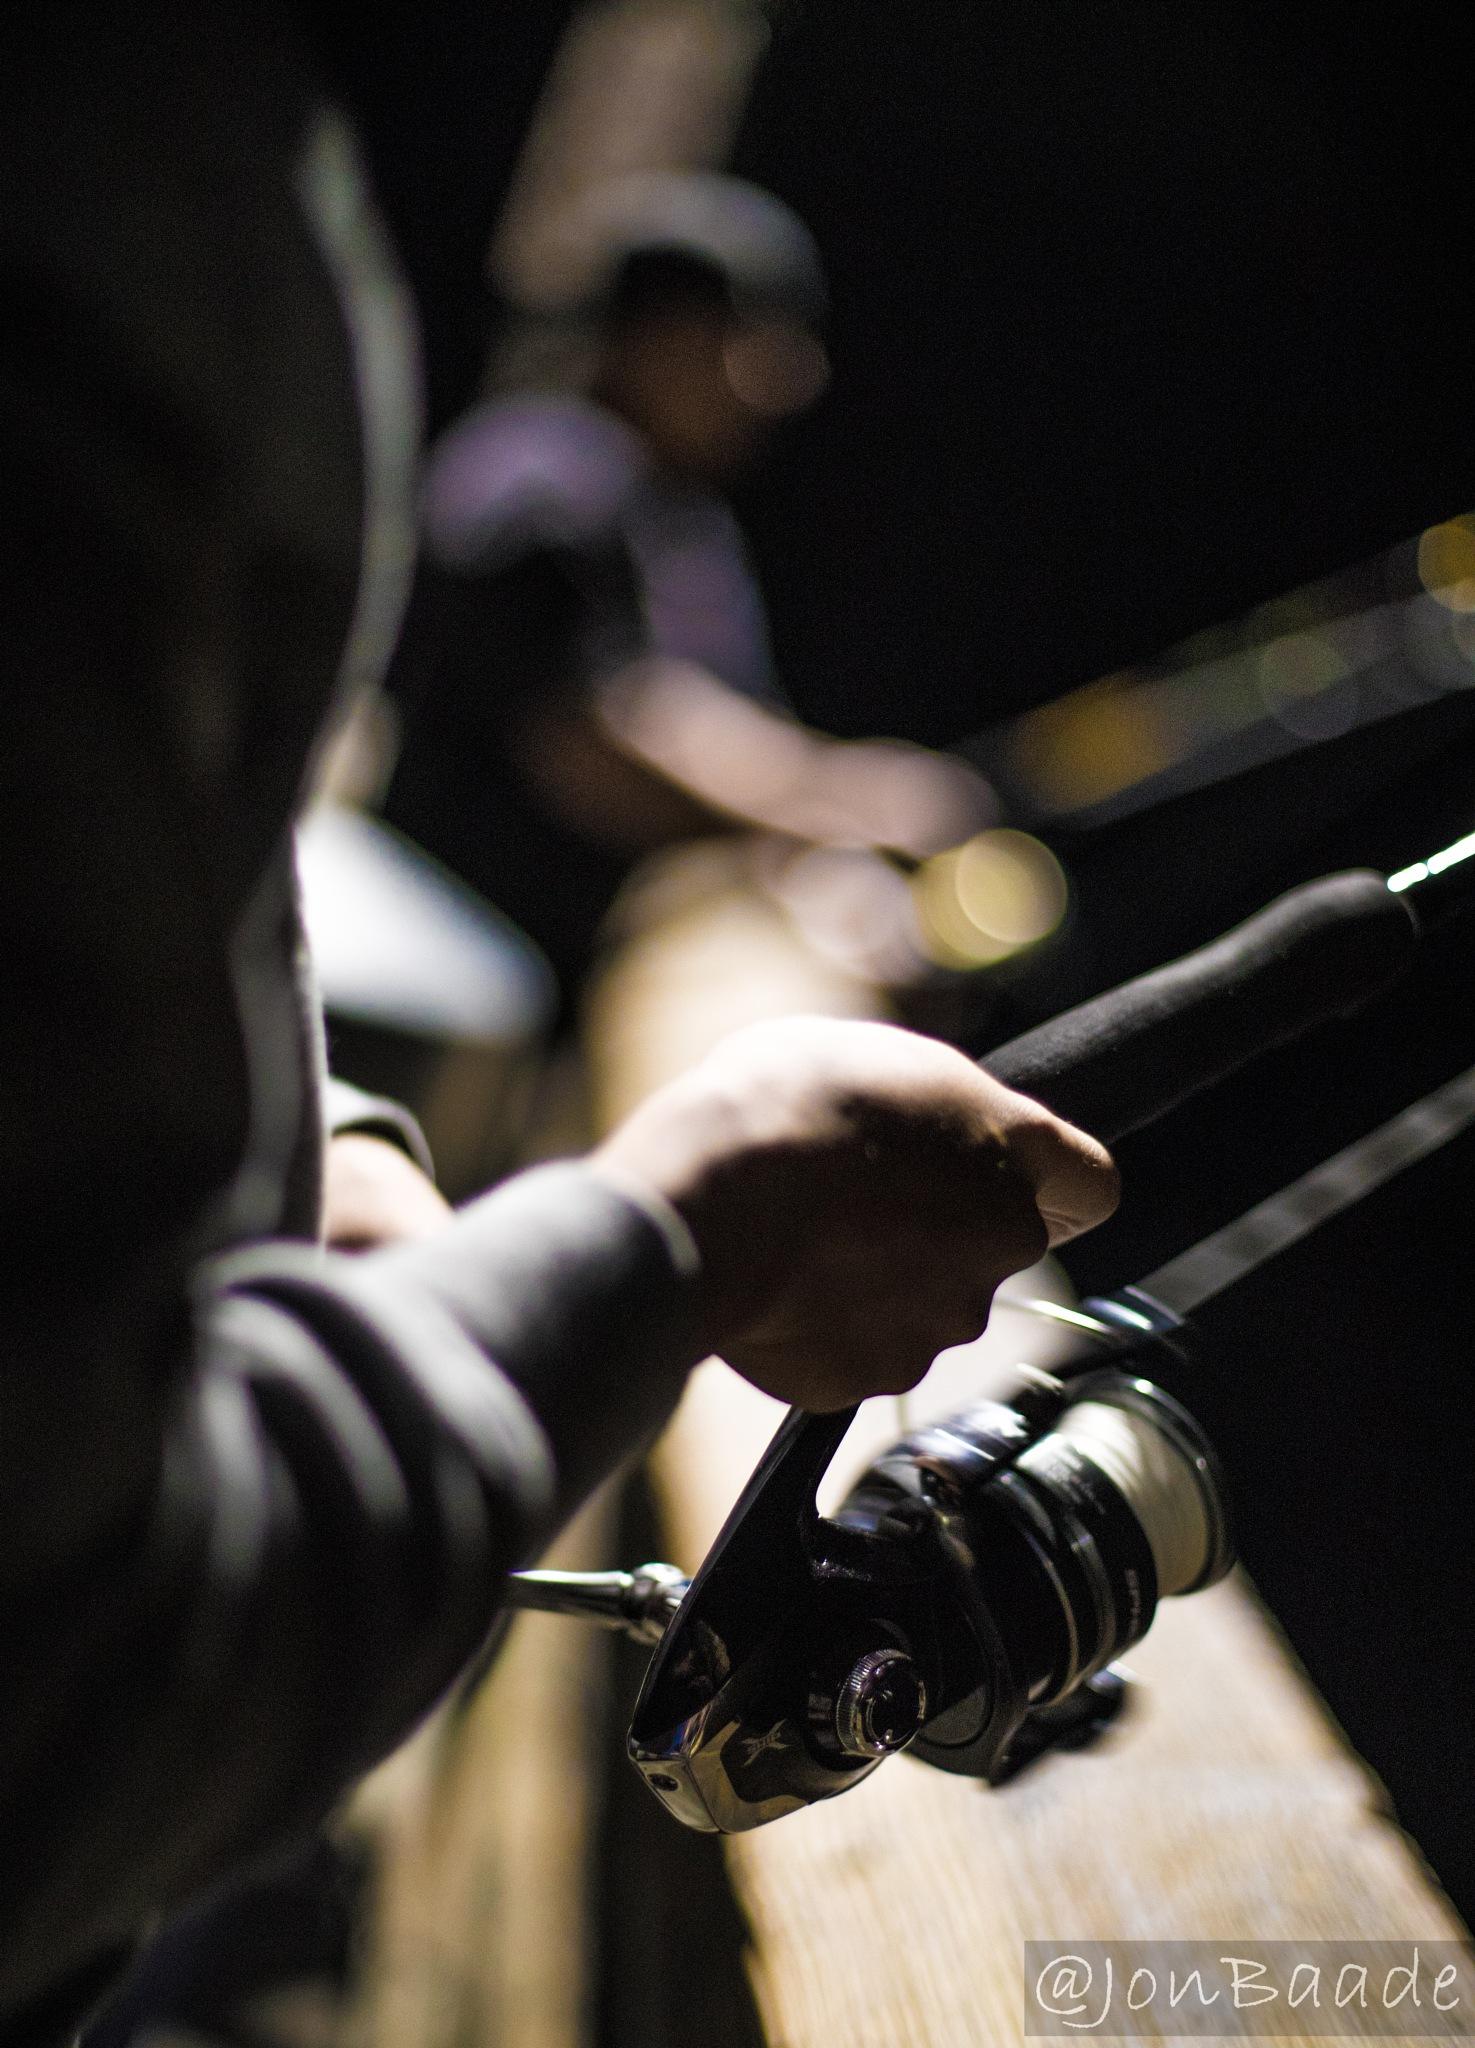 Fishing by Jon Baade